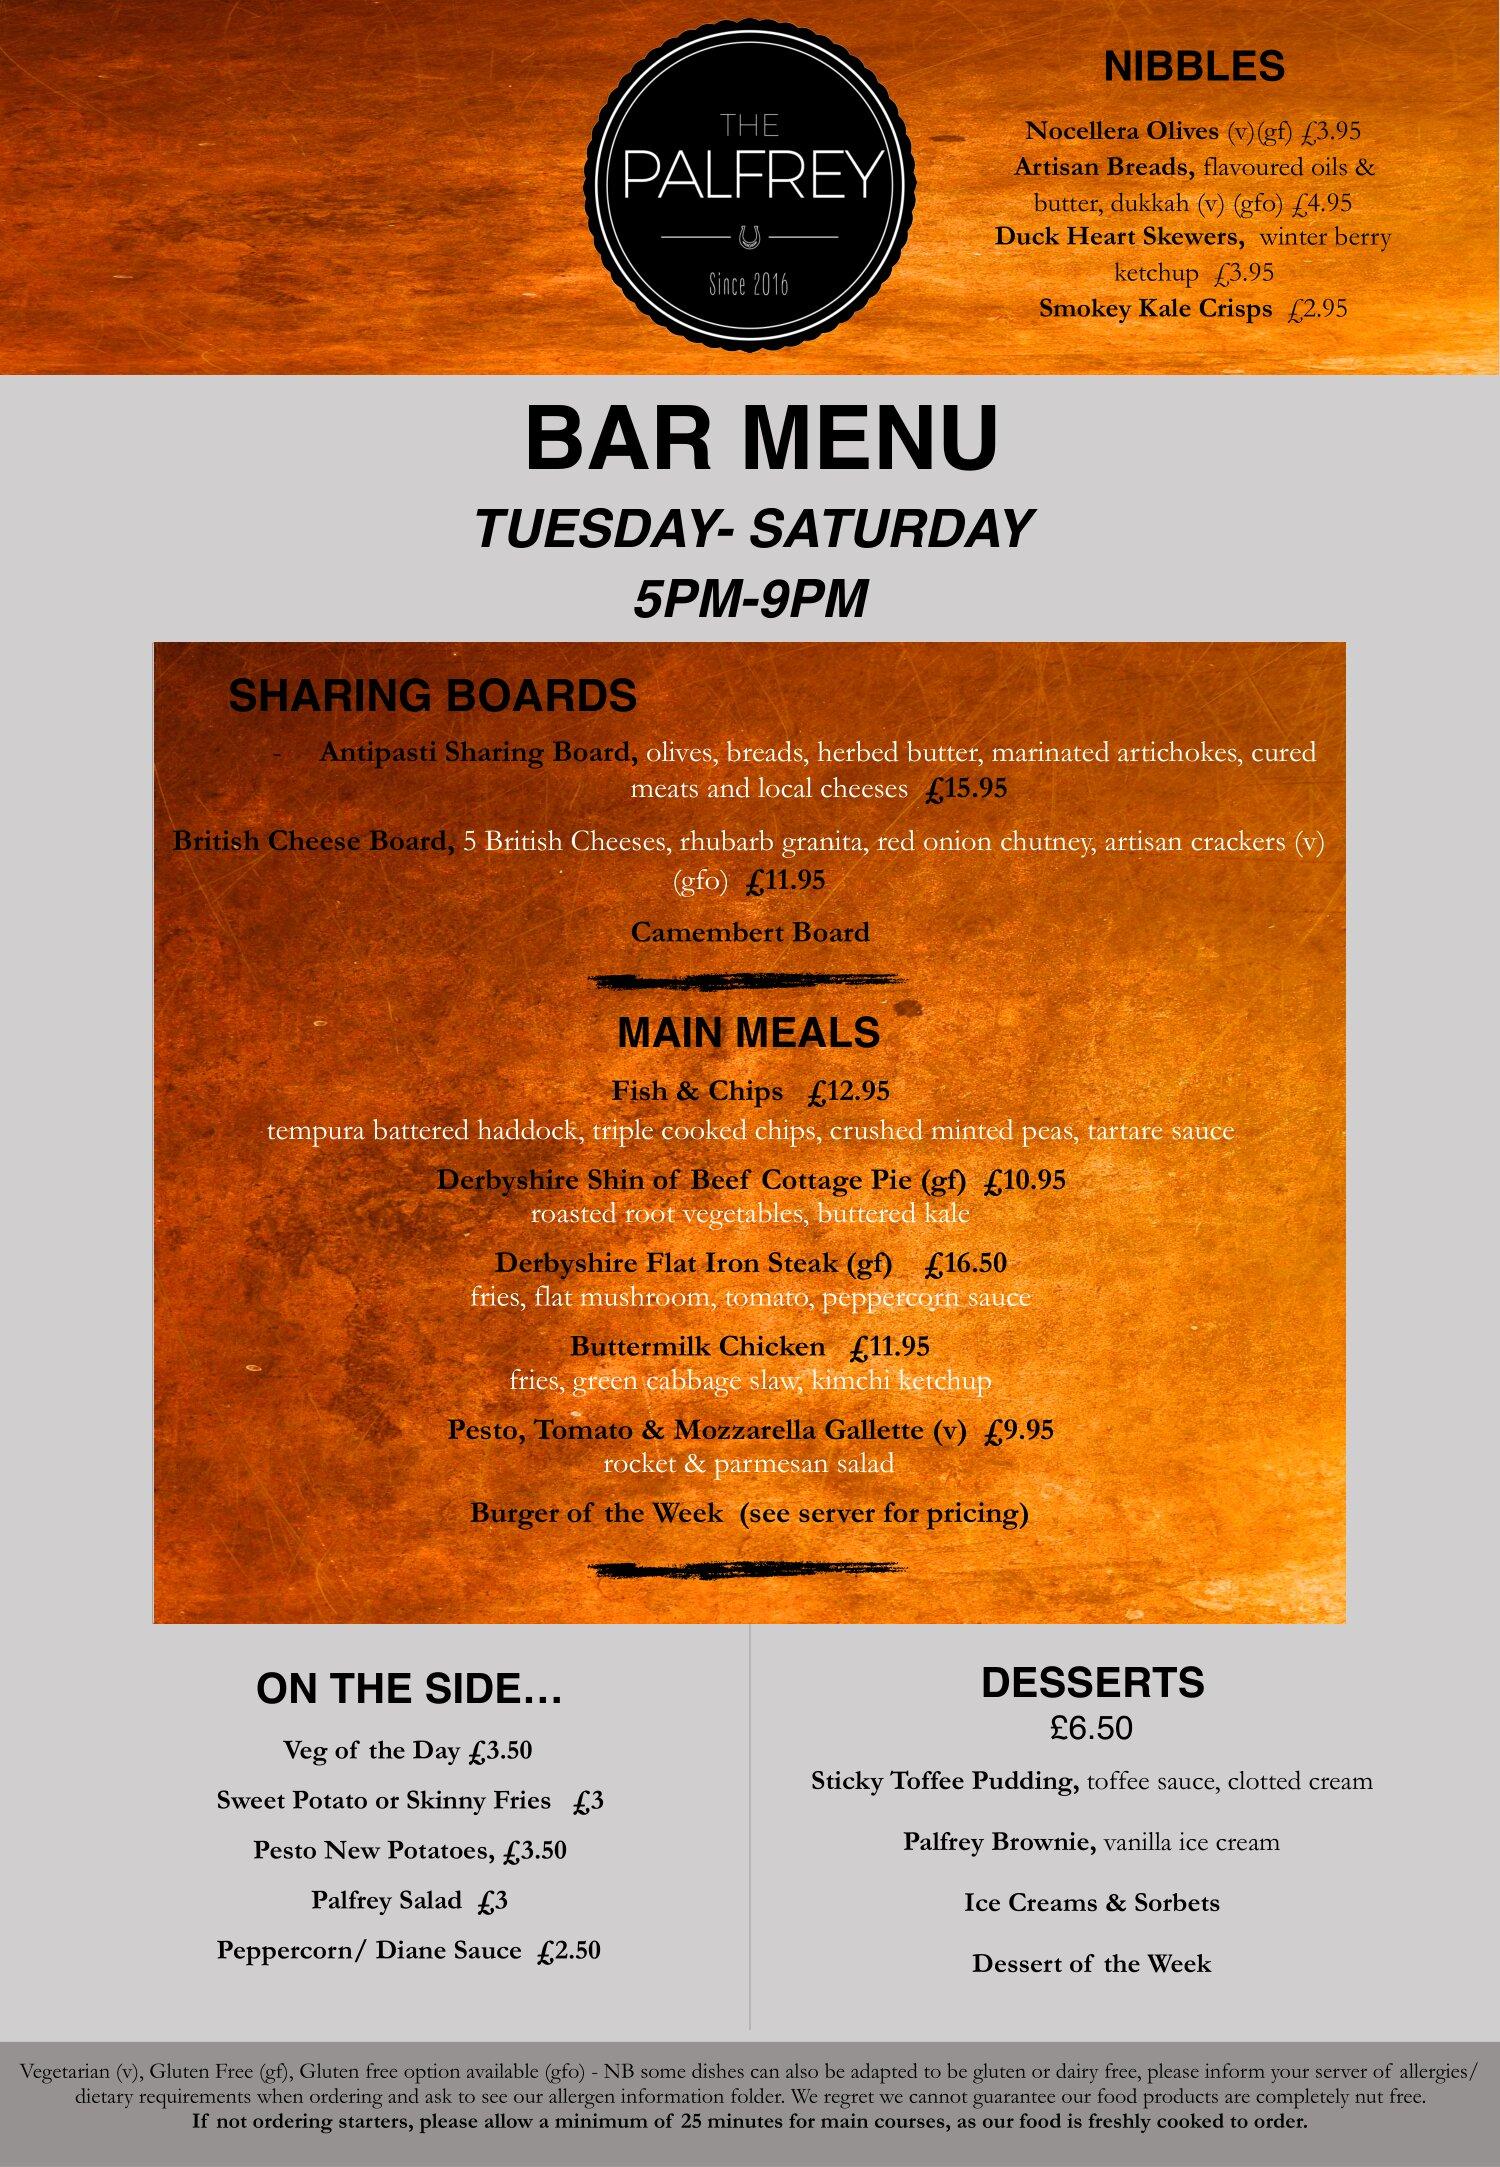 Palfrey Bar Menu_1-1